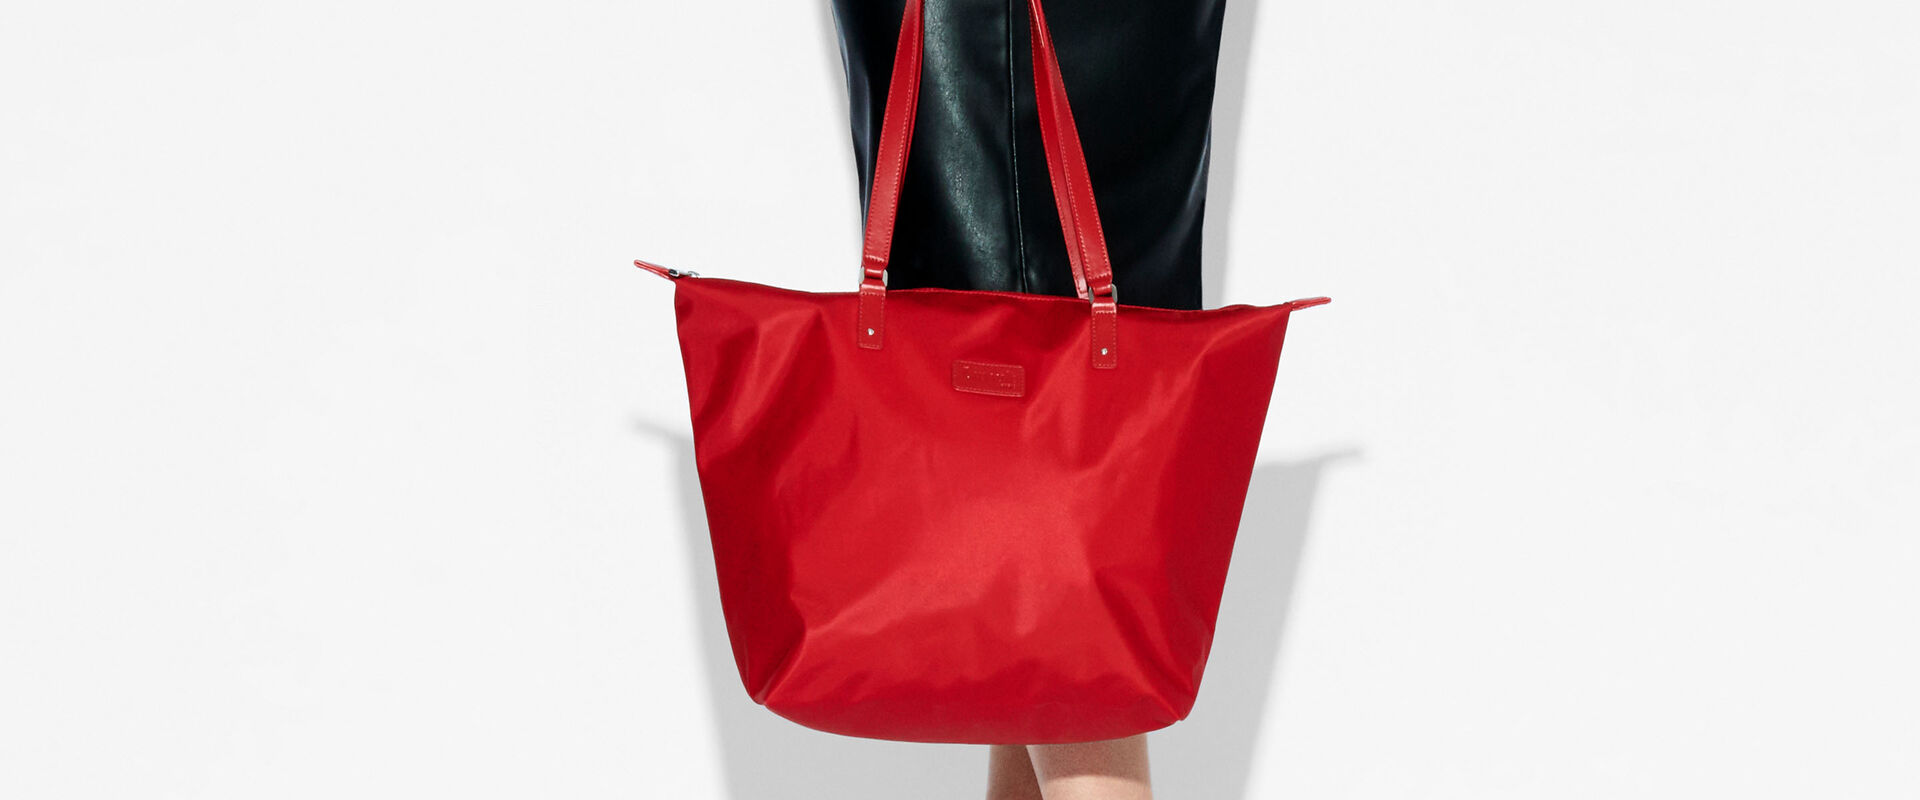 Shopping bags | Lipault